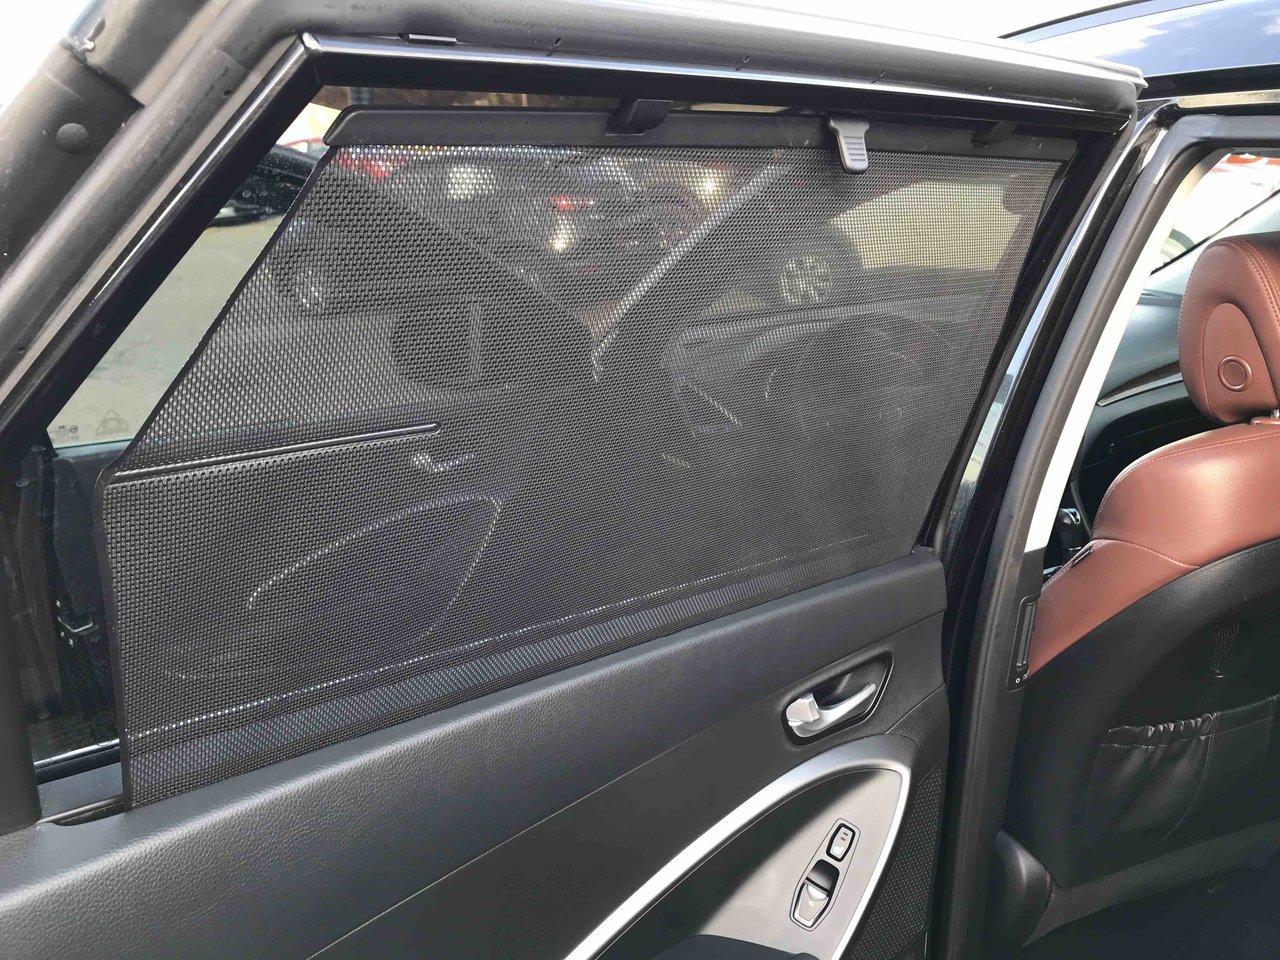 Photo 2013 Hyundai Santa Fe XL 3 ROWS! LIMITED! LEATHER! AWD! PANO ROOF! LIMITED! LEATHER! AWD! PANO ROOF!